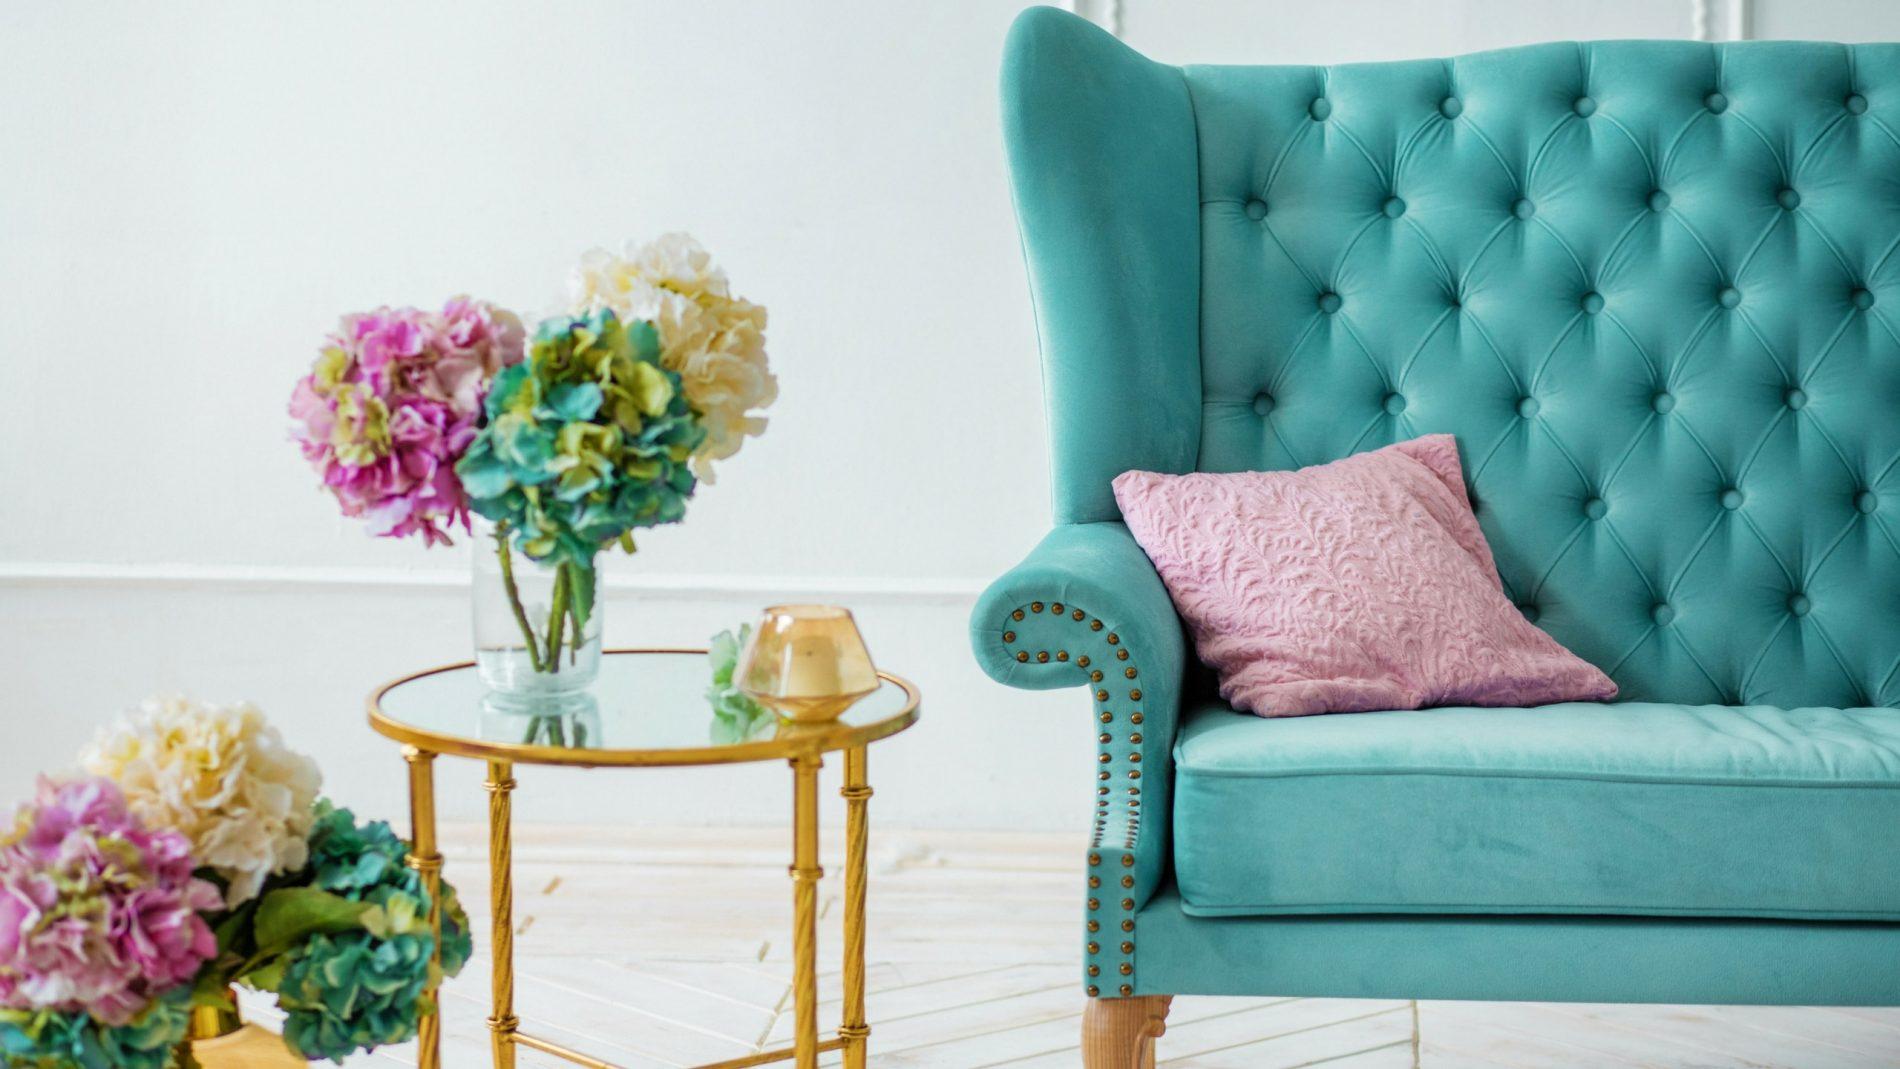 Spring 2018 Home Interior trends